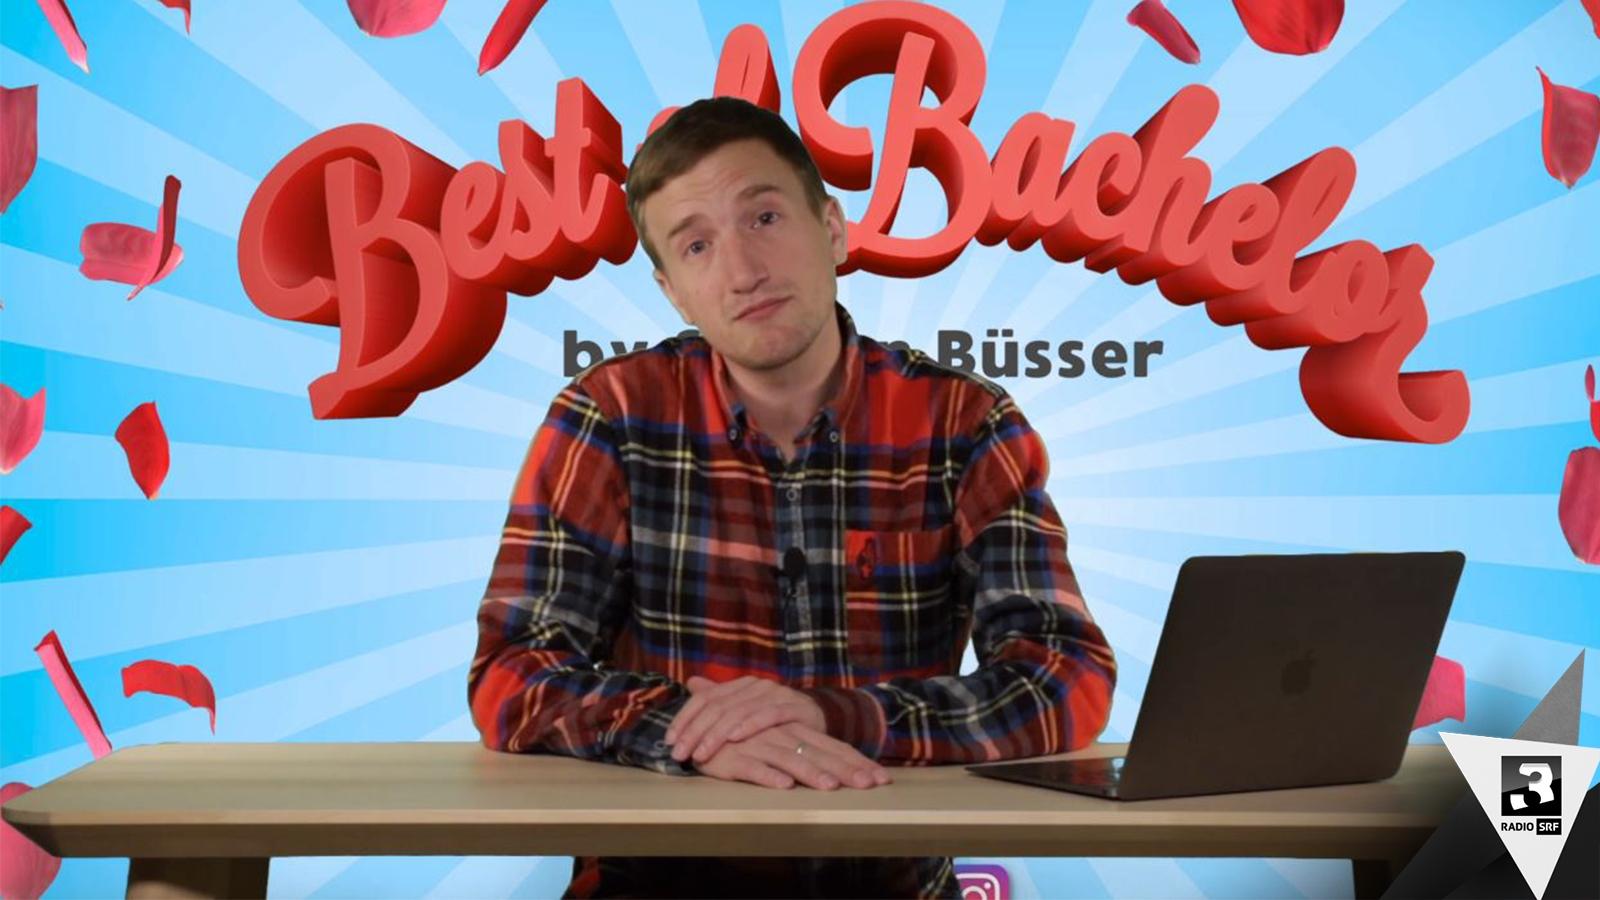 Stefan Büssers Best of Bachelor: Nummer 8